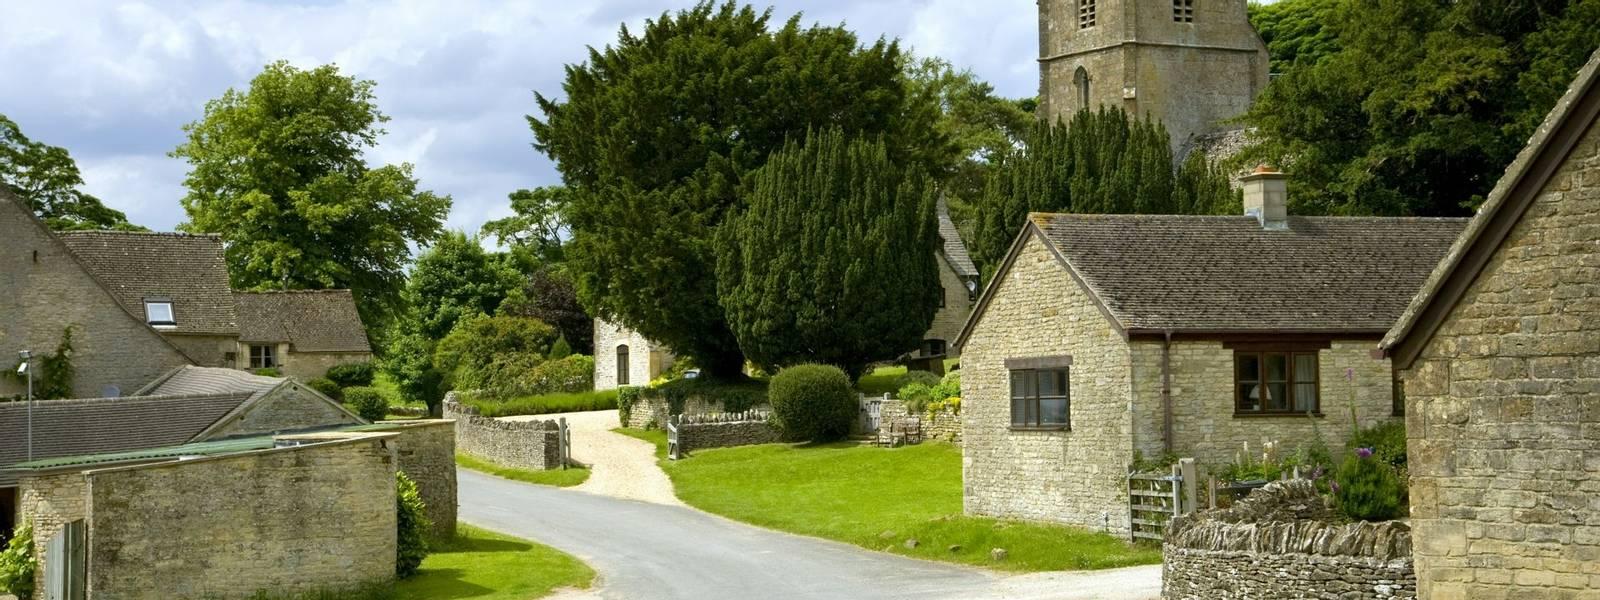 The tiny rural Cotswold hamlet of Hampnett, Gloucestershire, UK